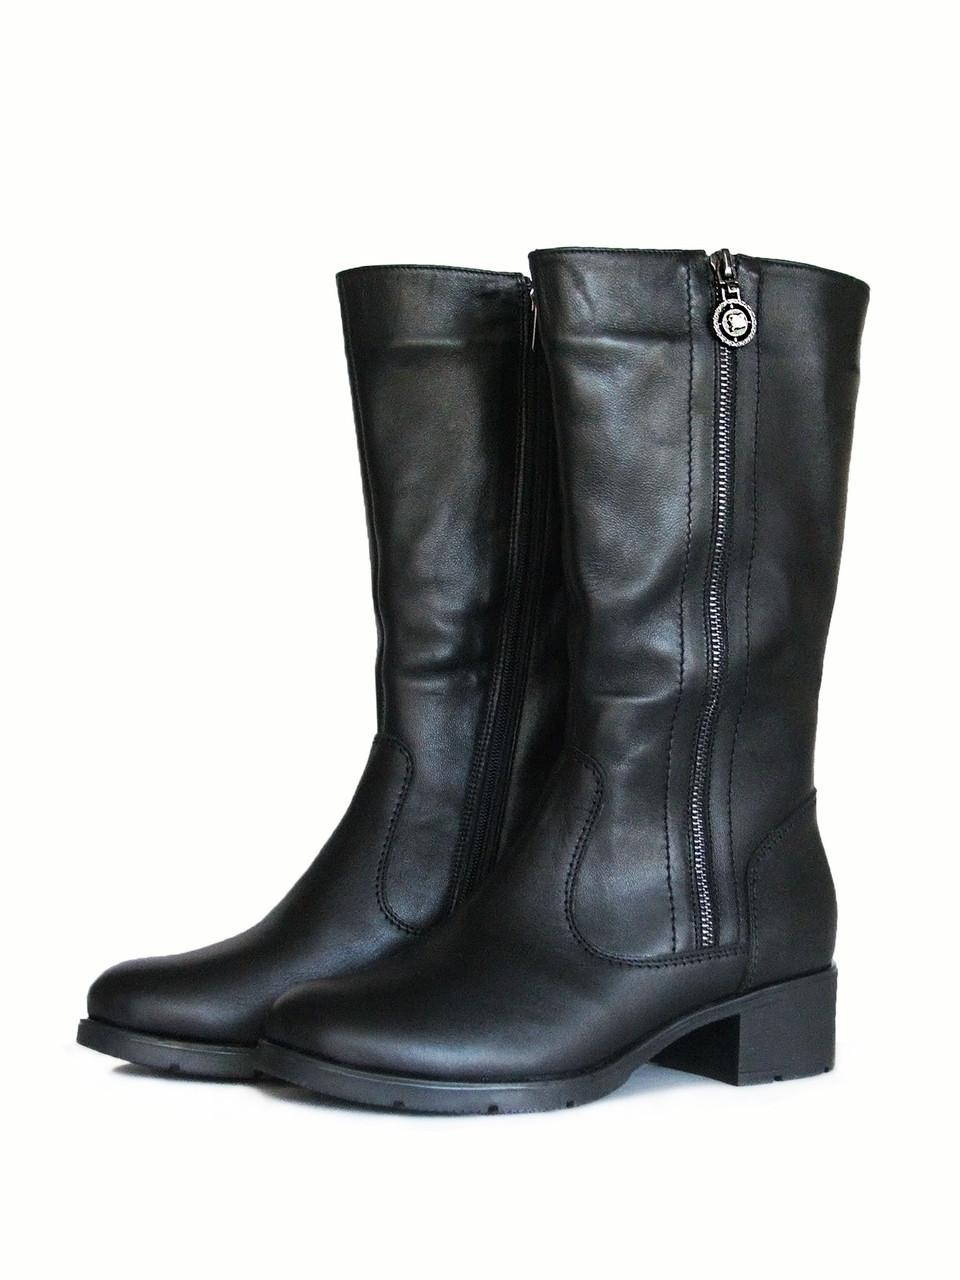 Теплые зимние полусапоги на устойчивом каблуке